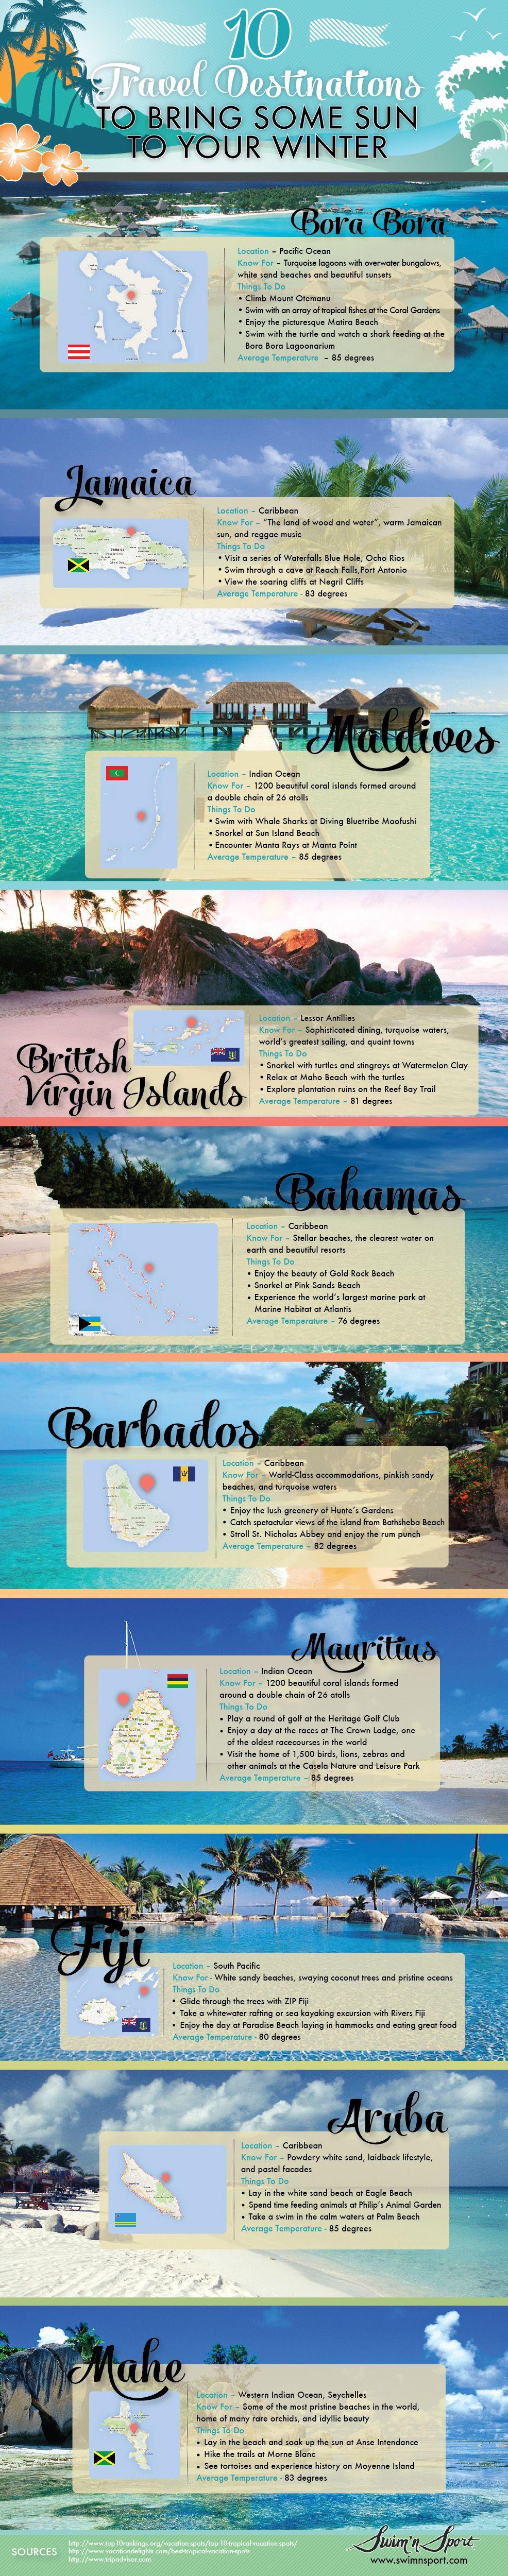 10 Sunny Travel Destinations